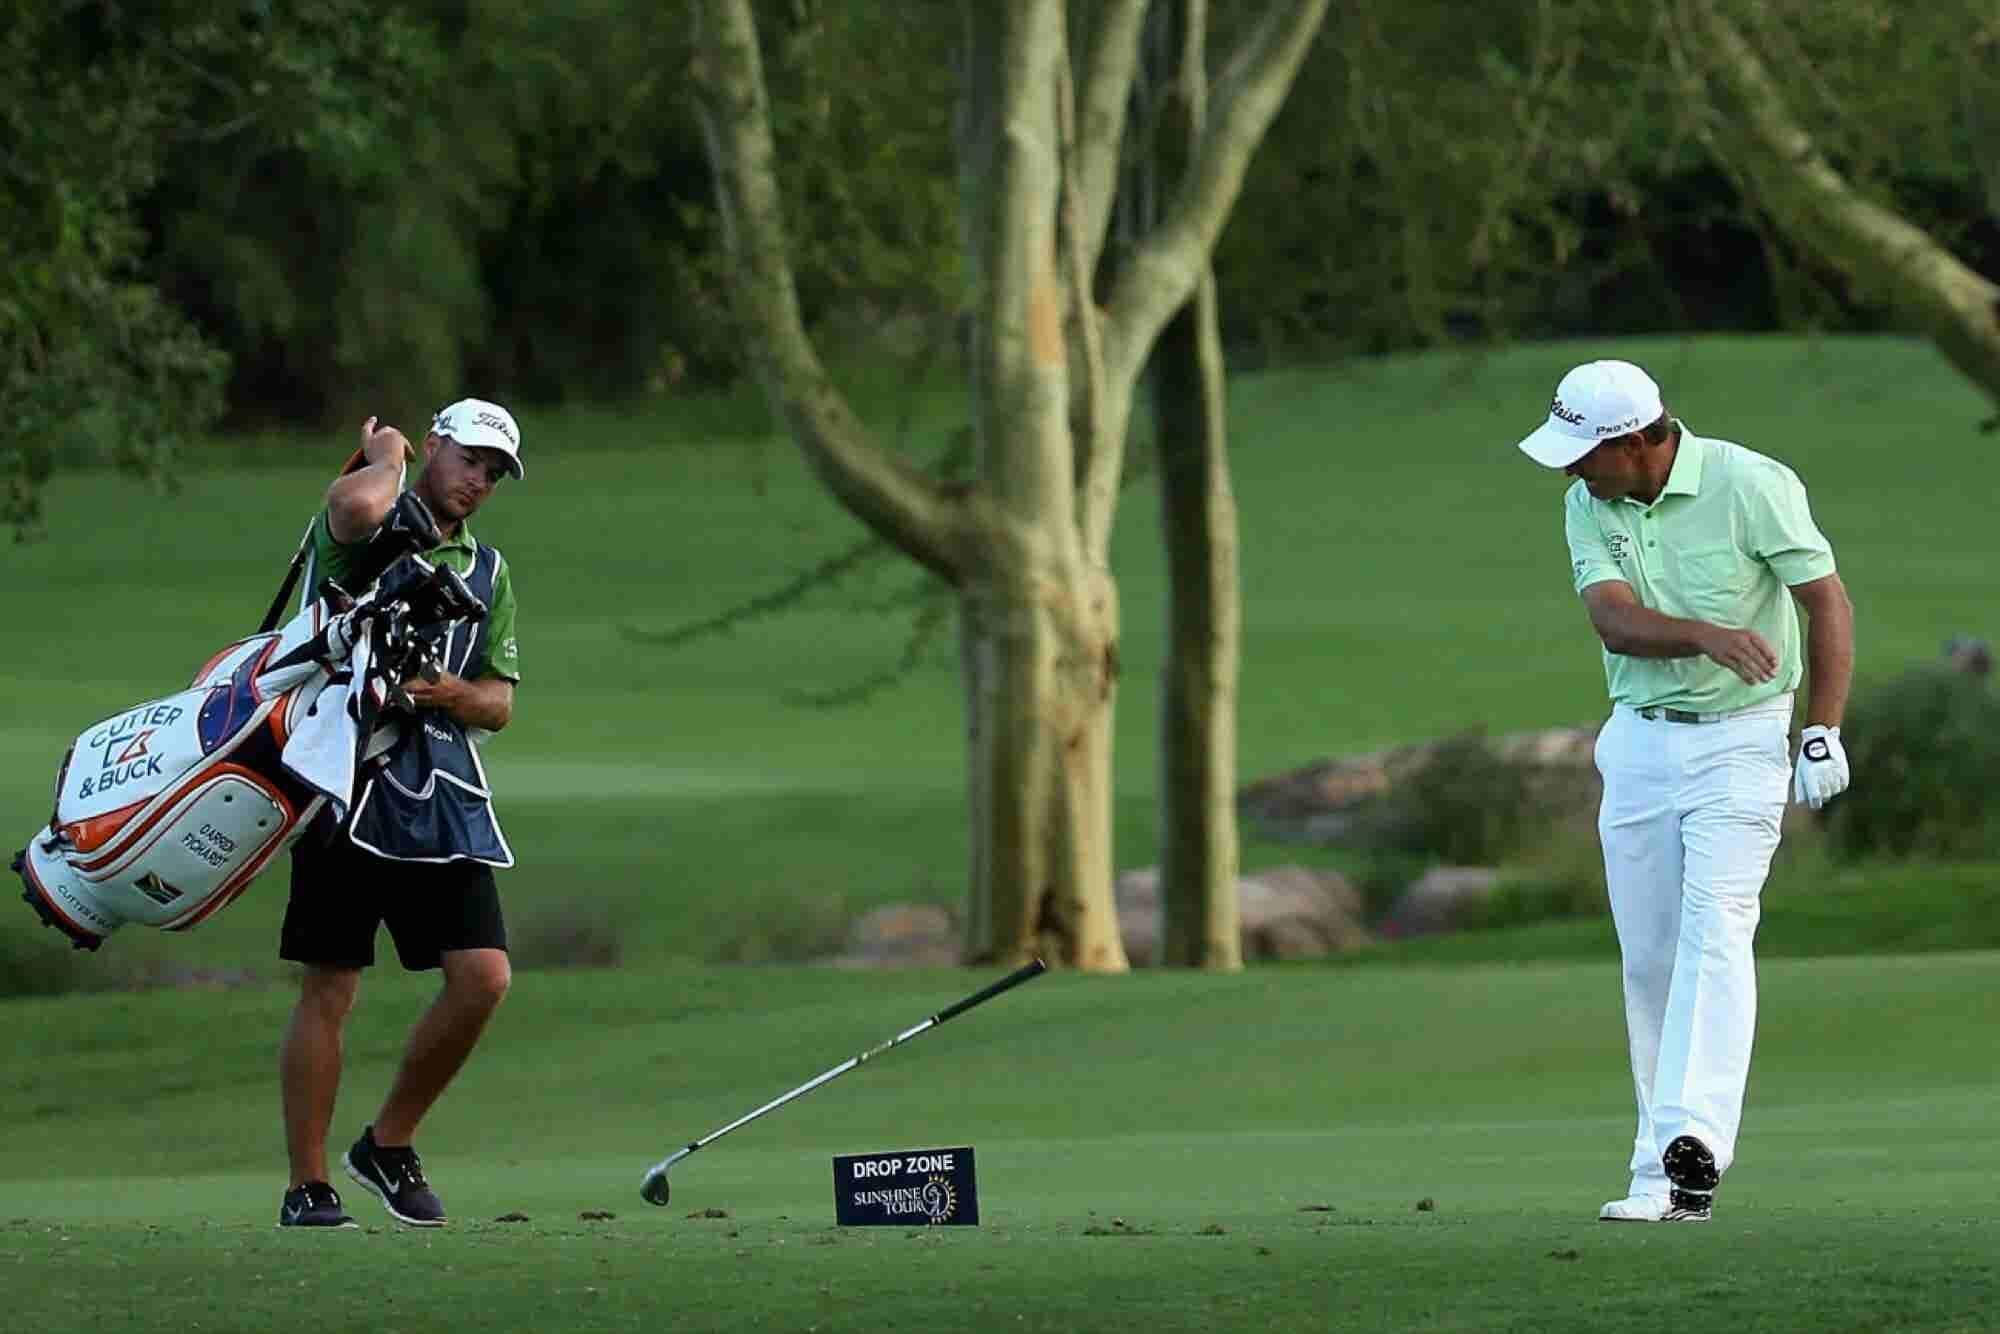 Nike Just Validated What I Already Knew: Golf Sucks